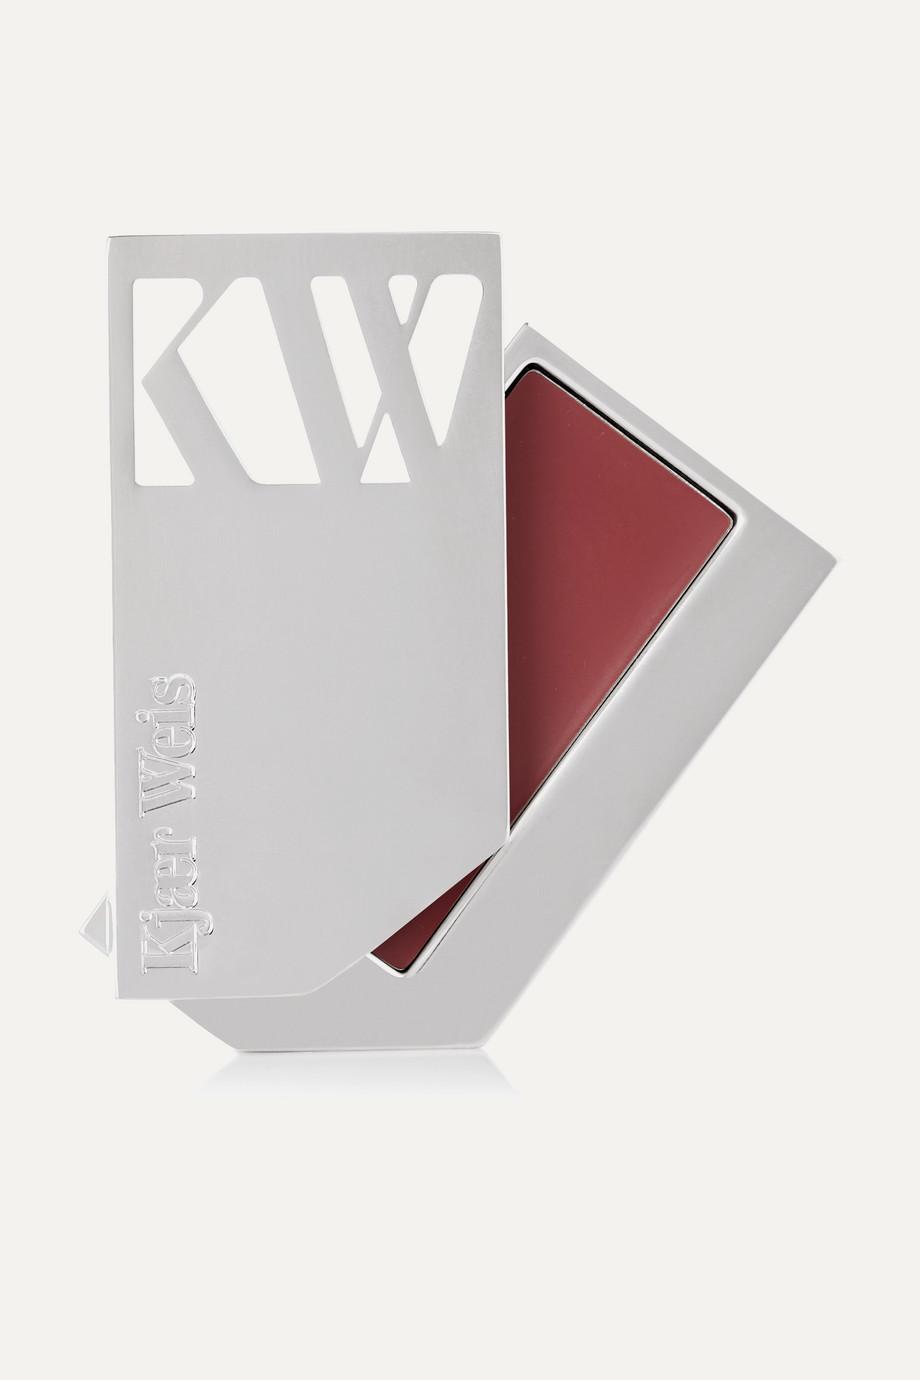 Kjaer Weis Lip Tint - Sensuous Plum